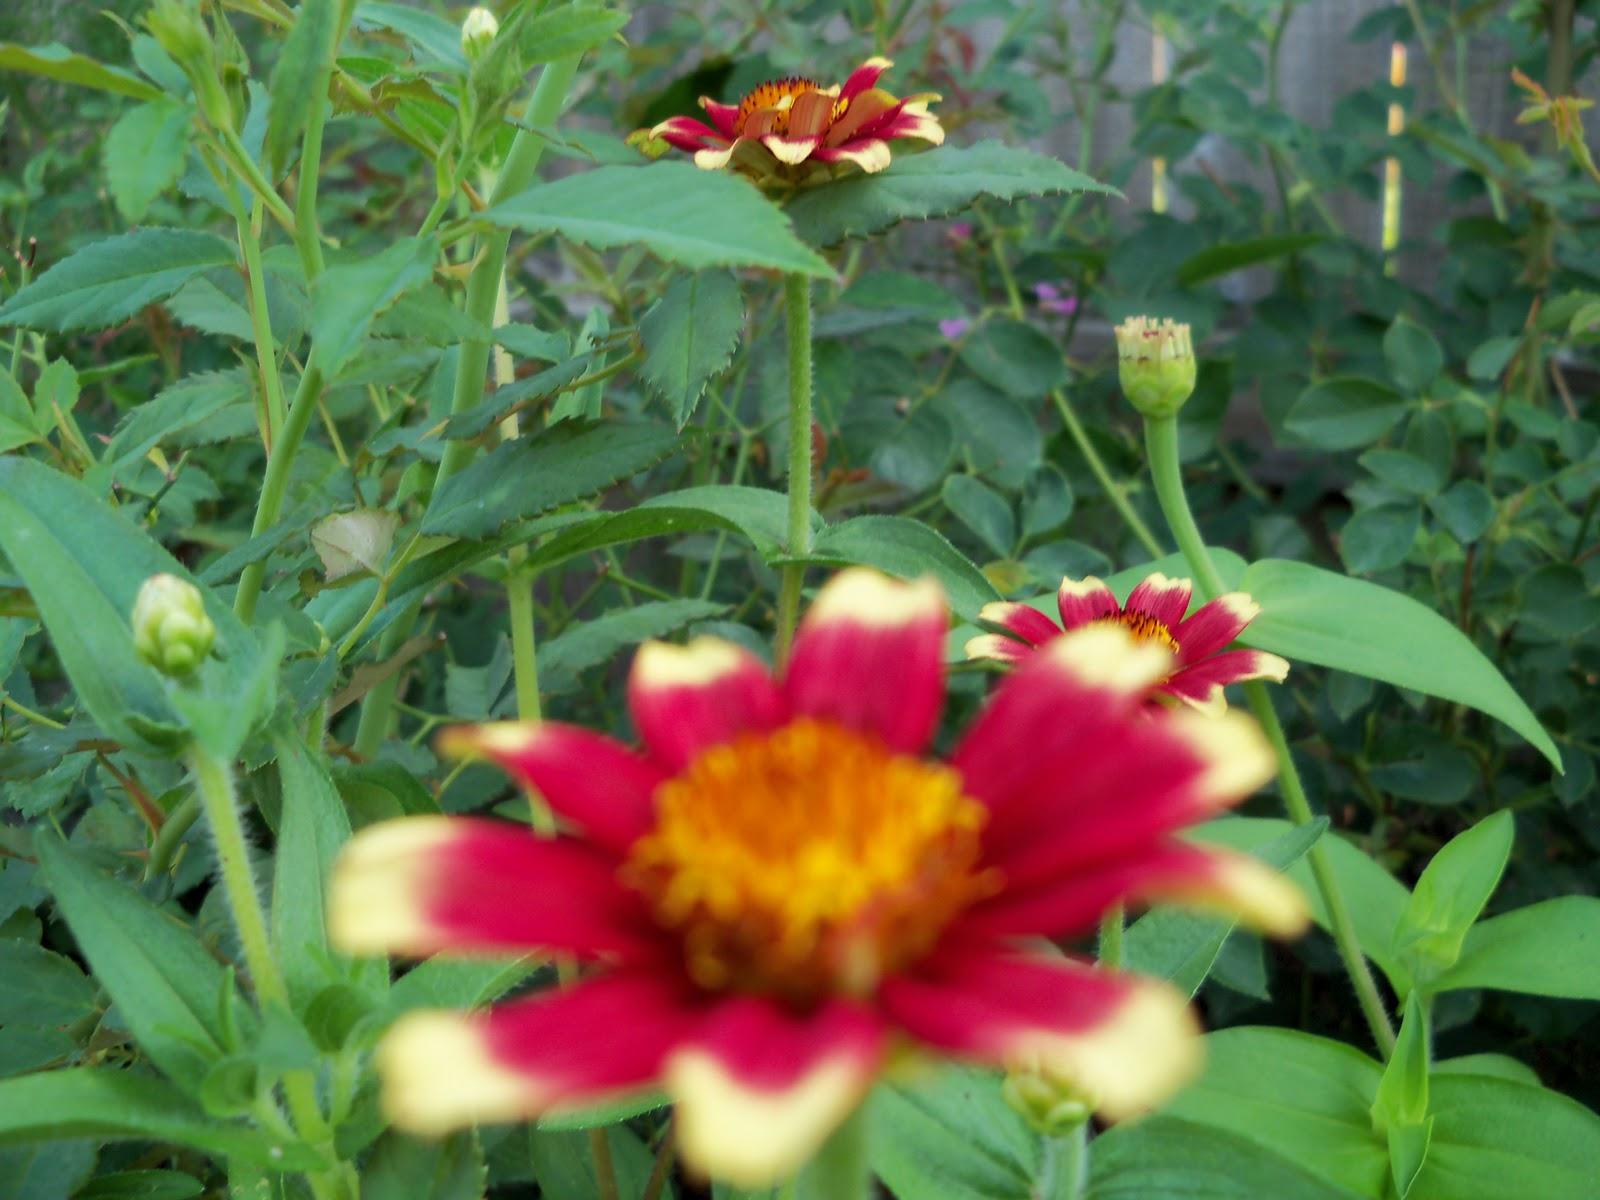 Gardening 2010, Part Two - 101_2997.JPG